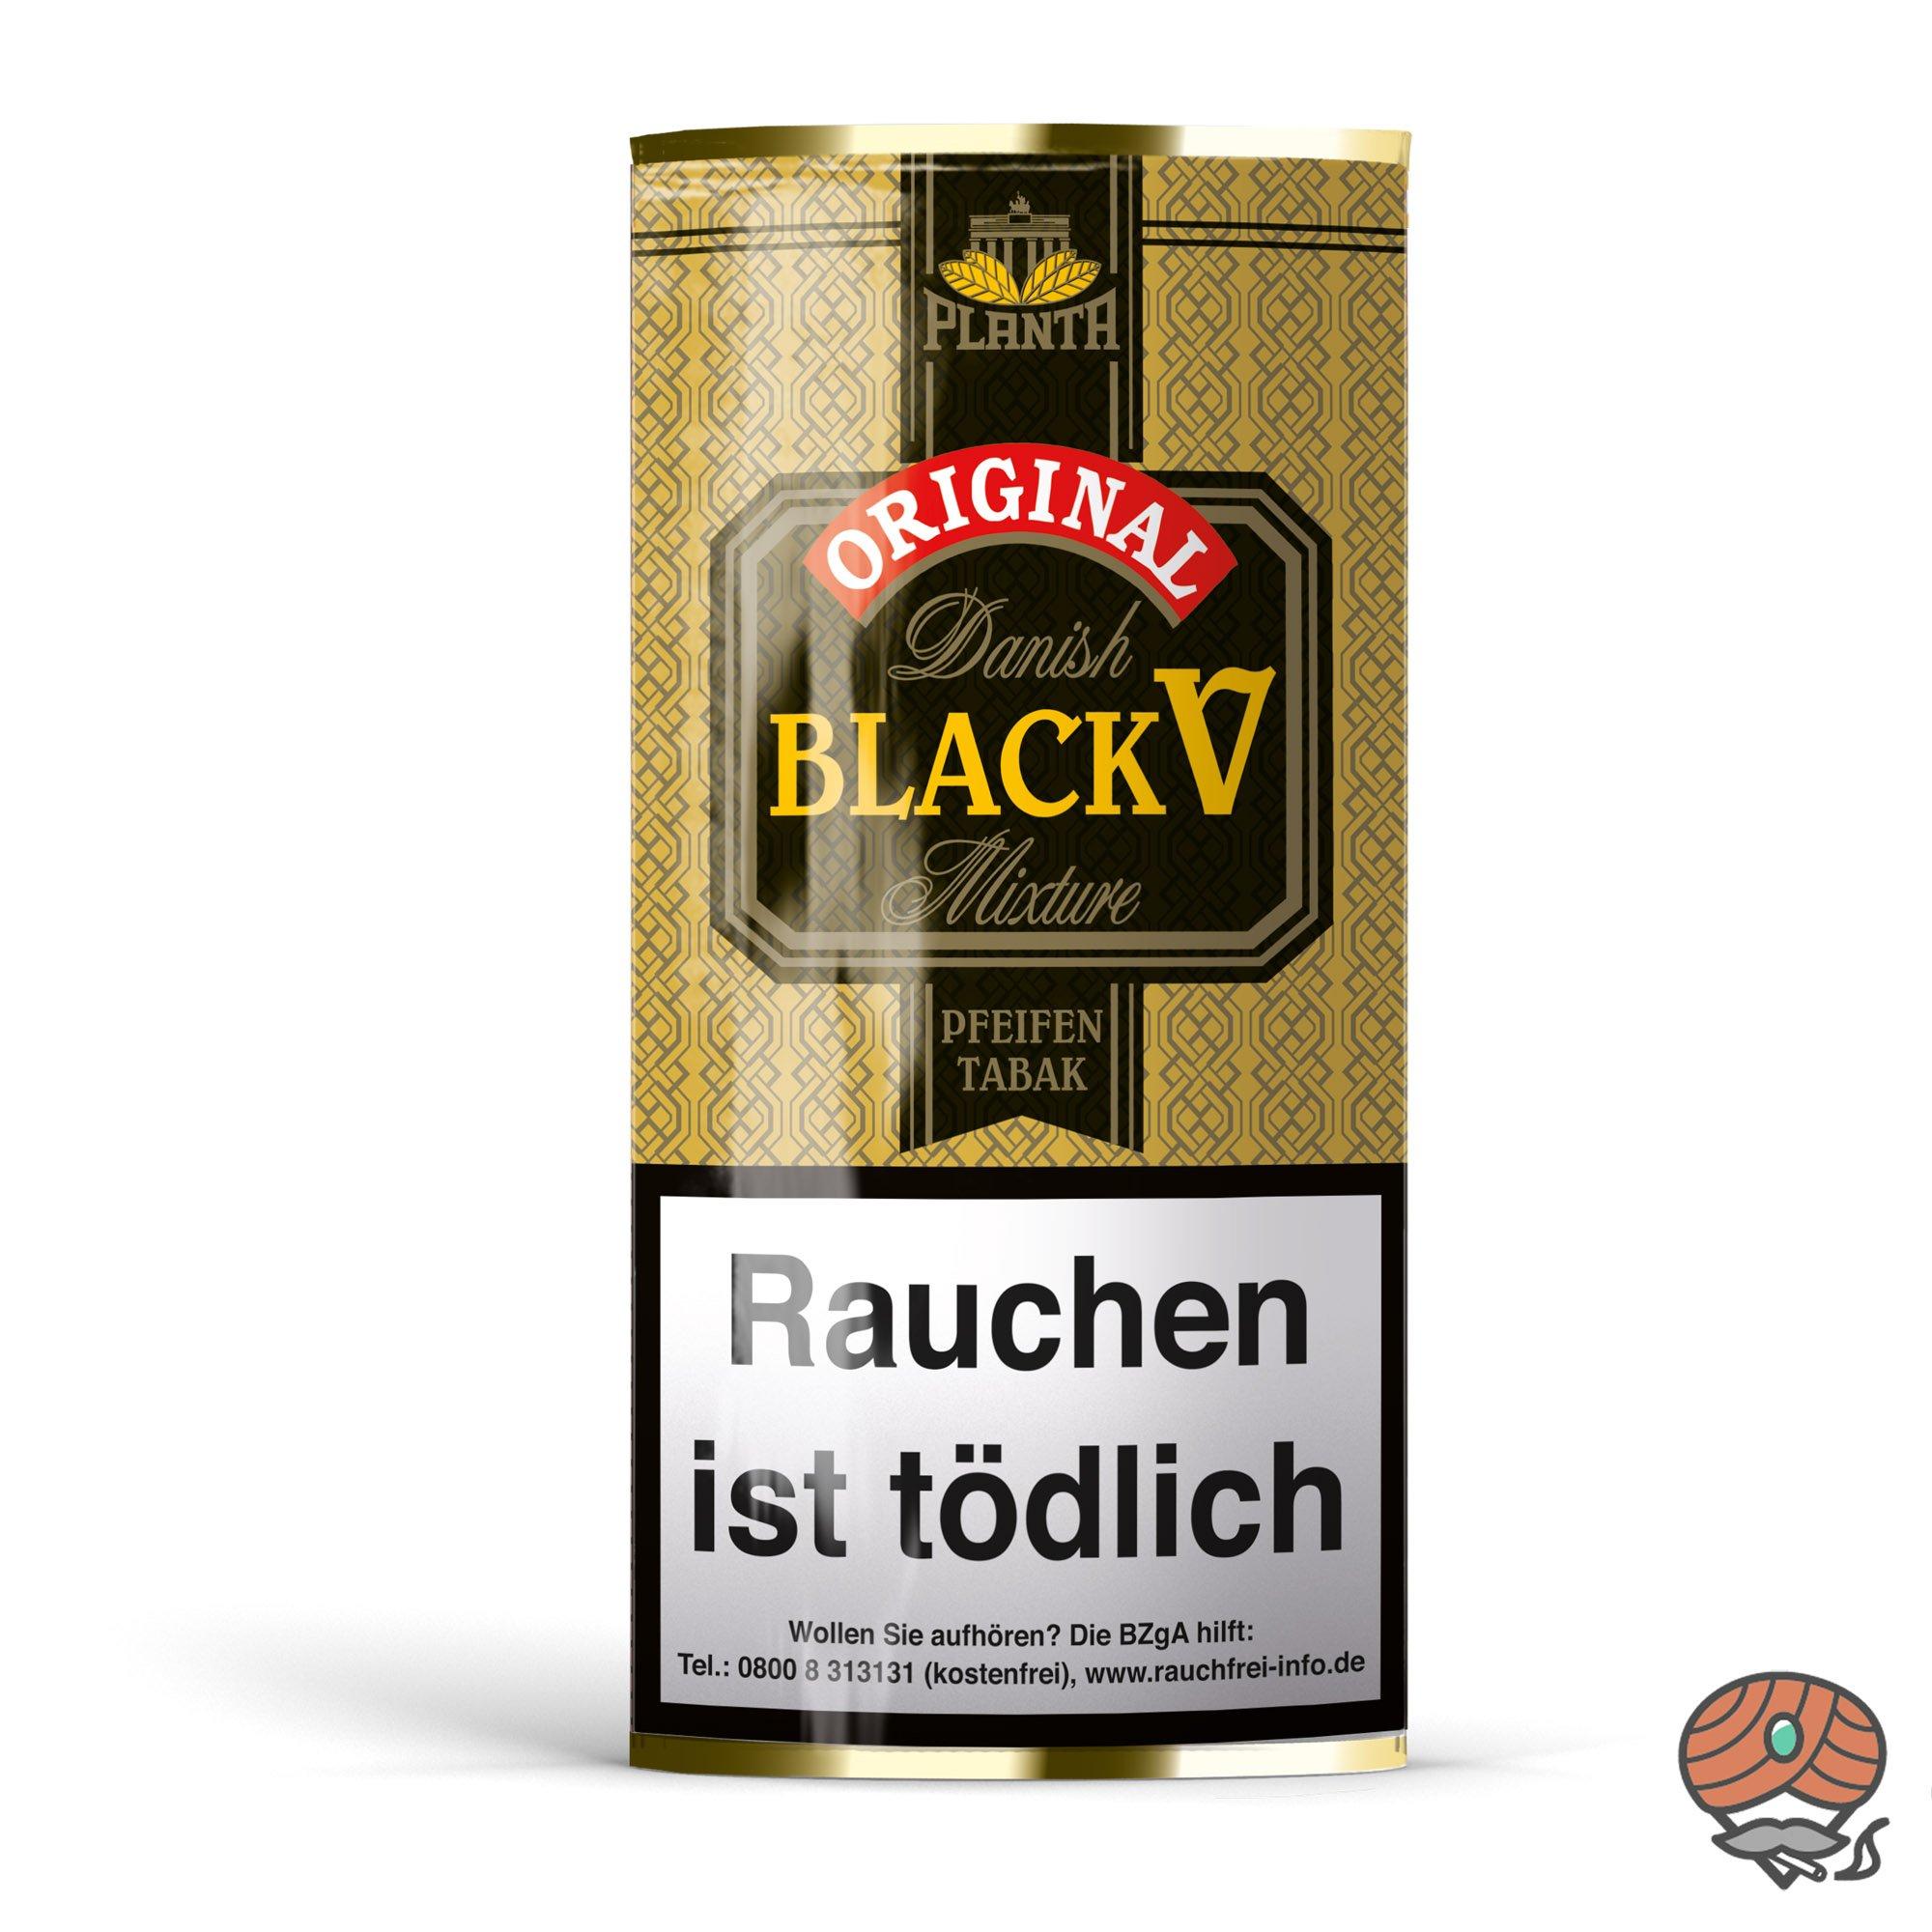 Danish Black V Pfeifentabak Vanille Aroma 40g Beutel